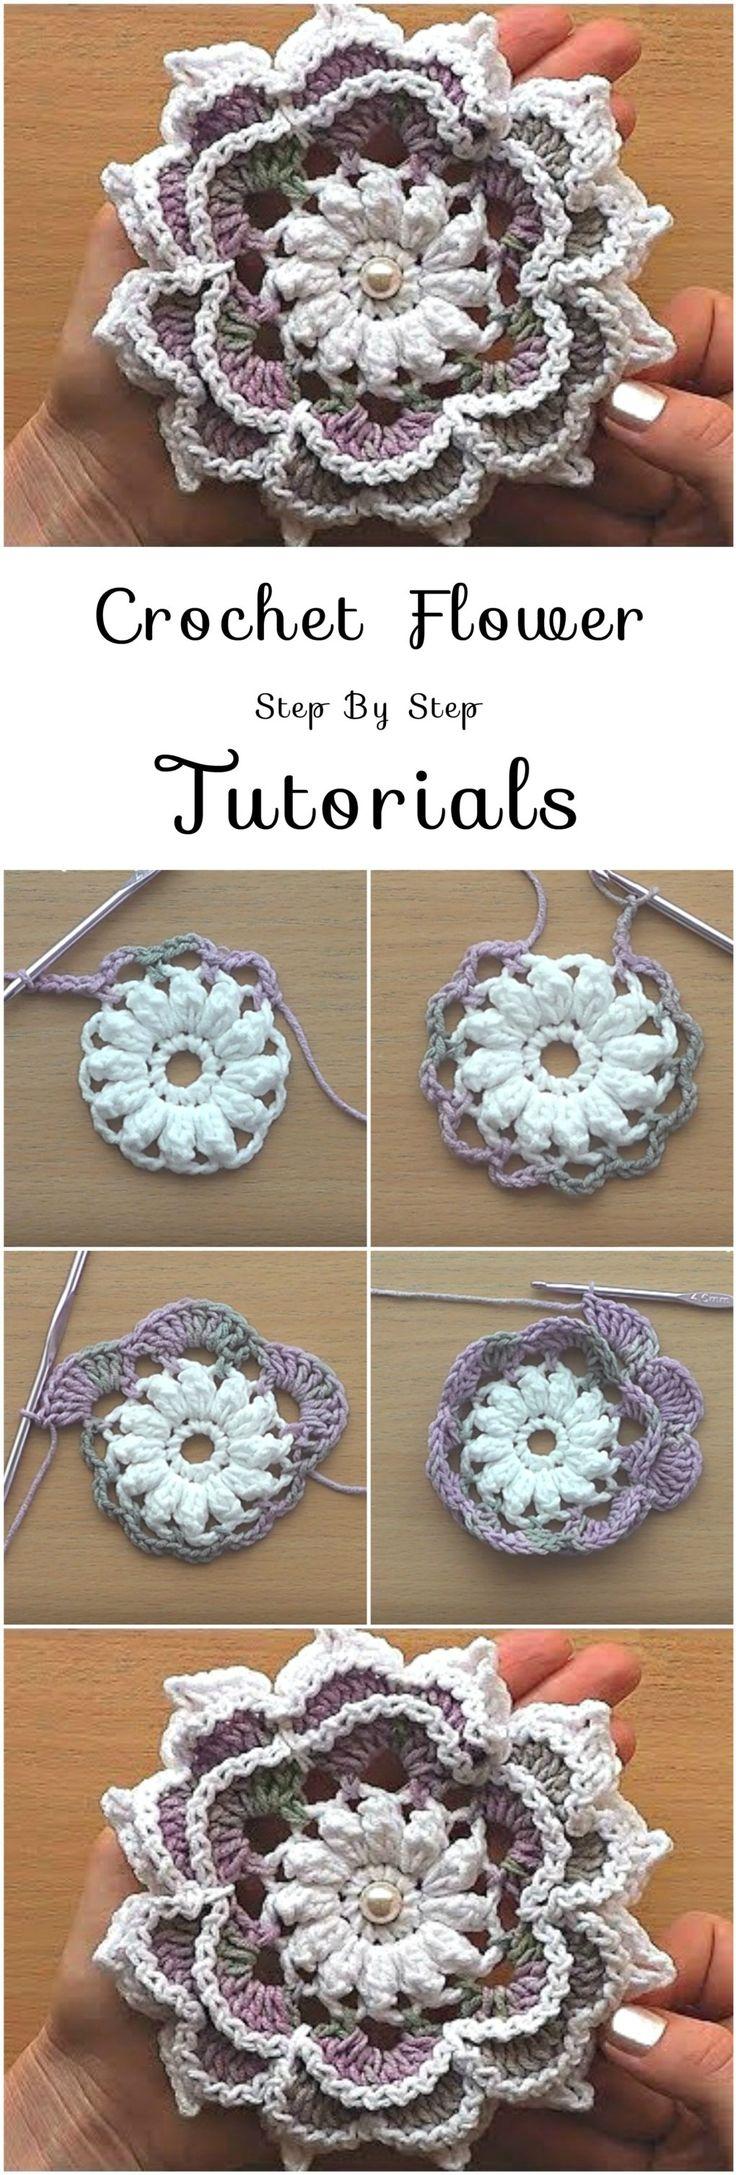 Crochet Flower – Step By Step Tutorials